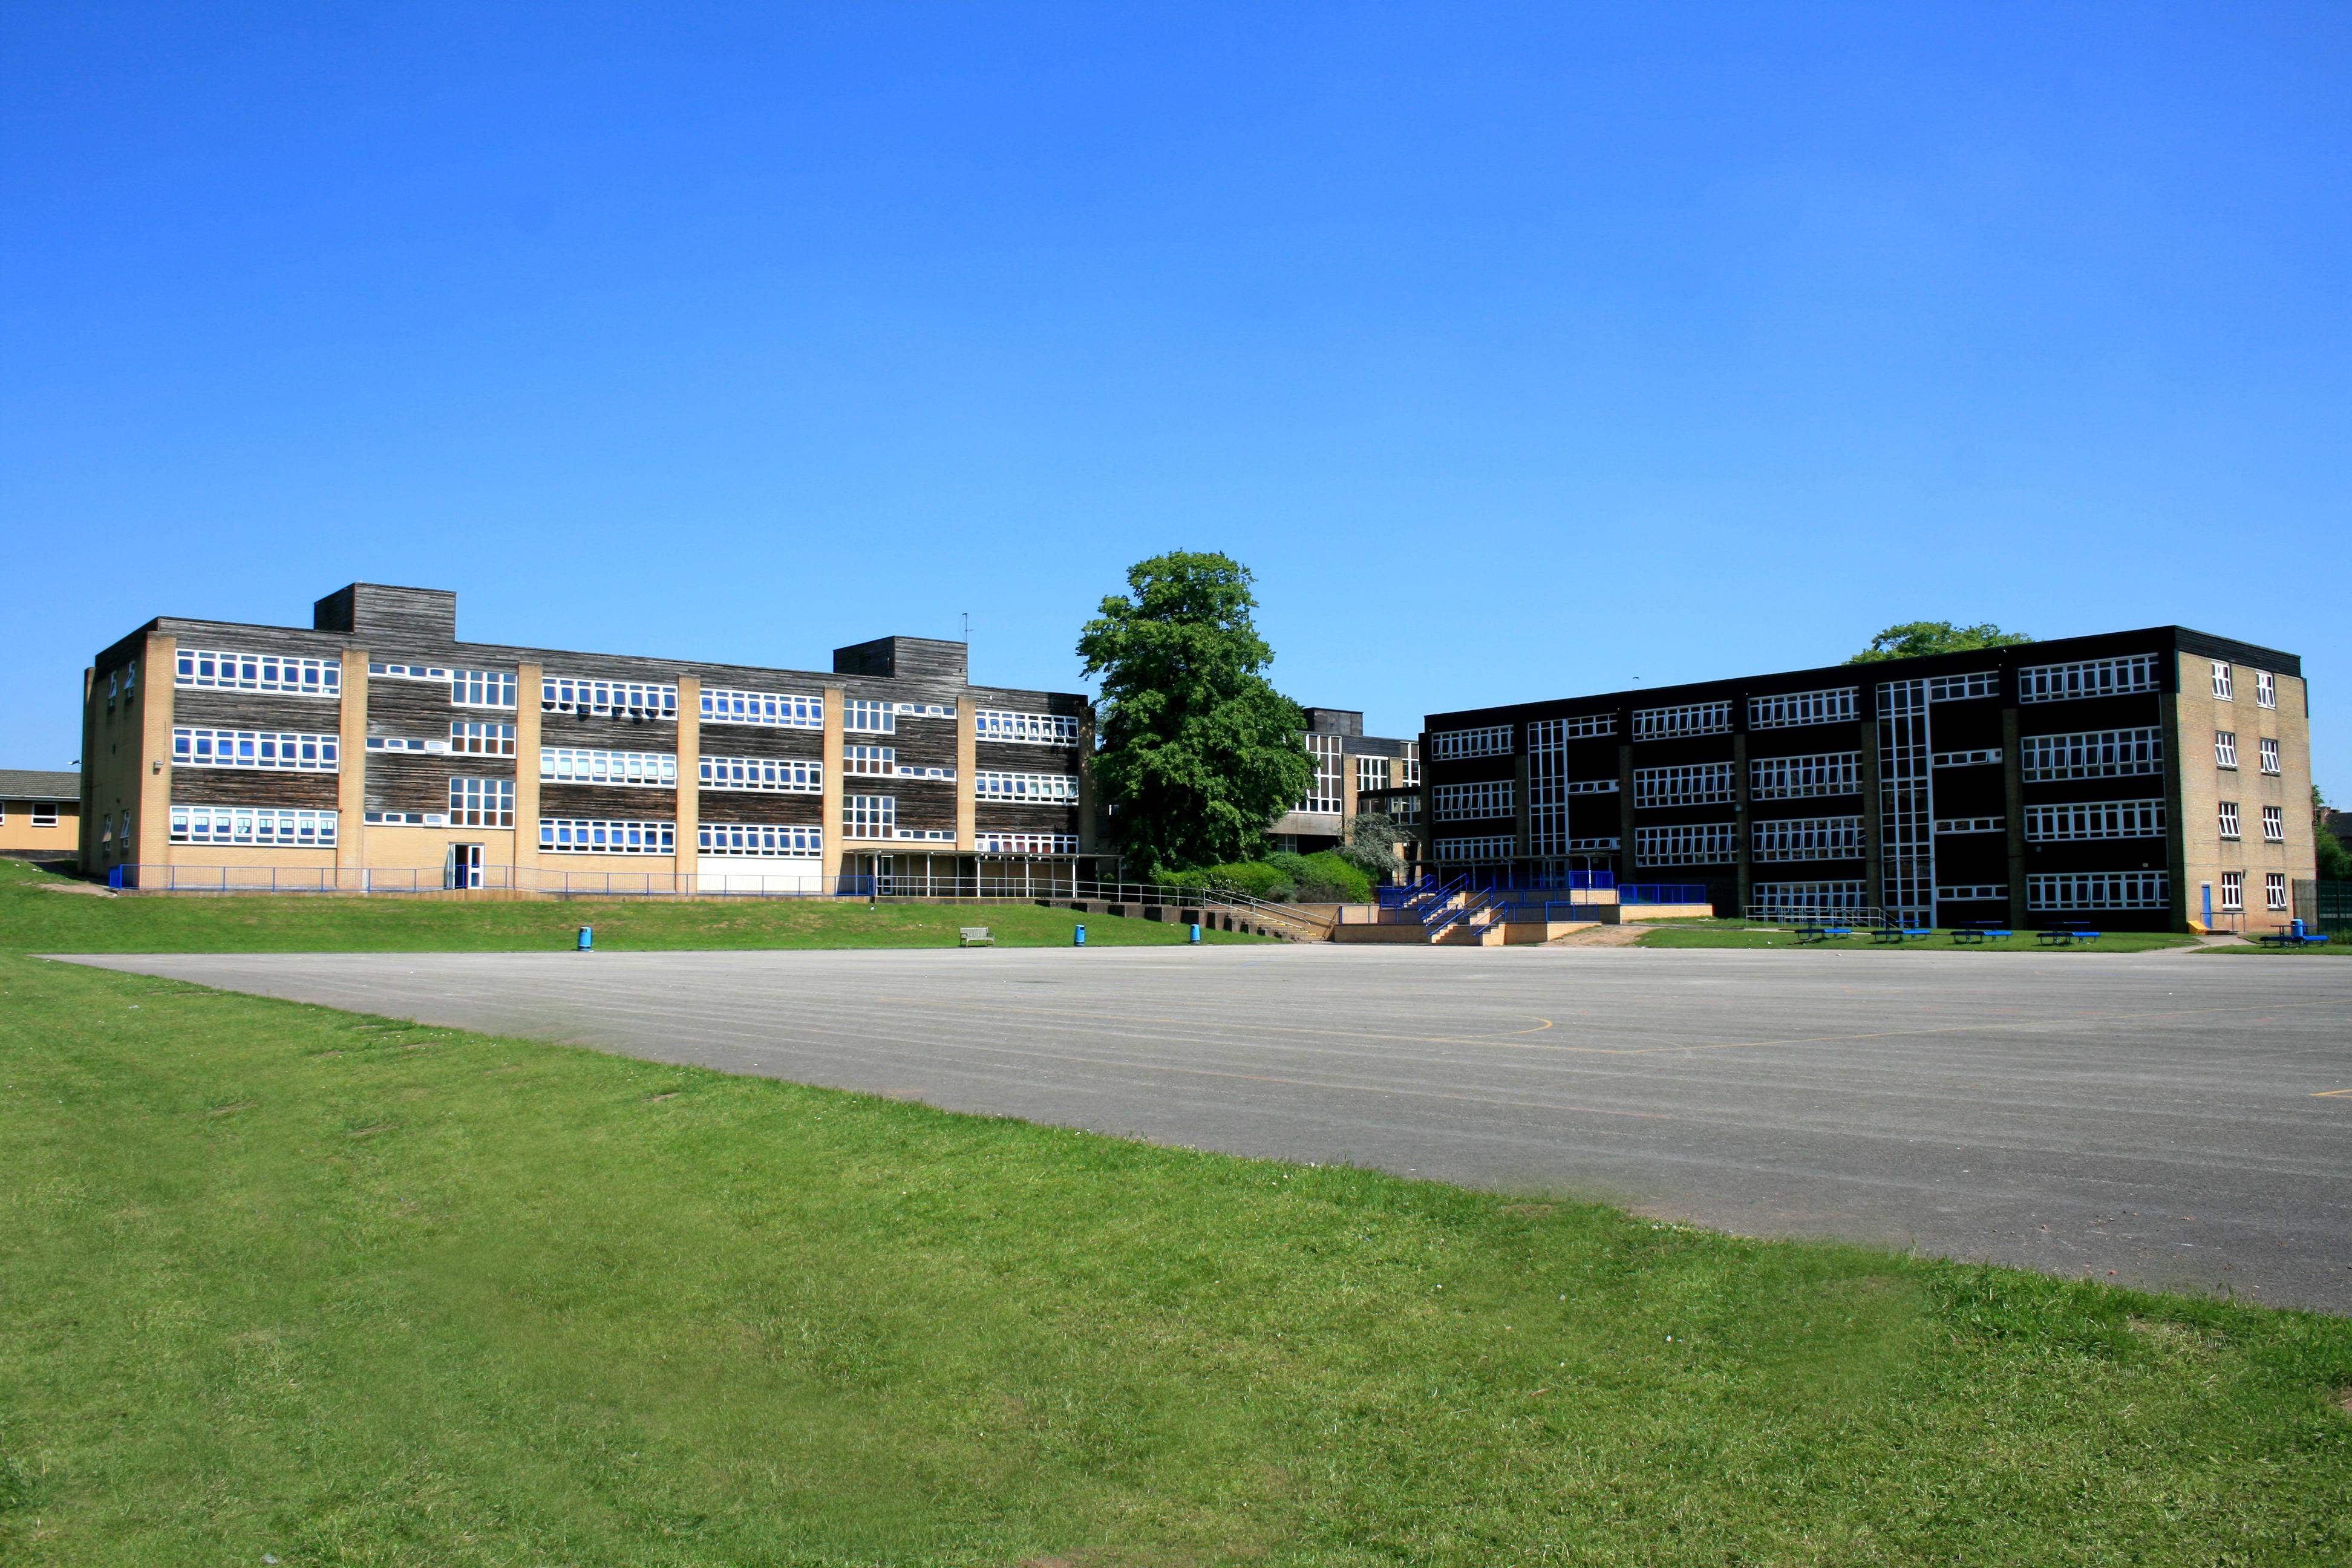 Welcome to<br>Blythe Bridge High School & Sixth Form